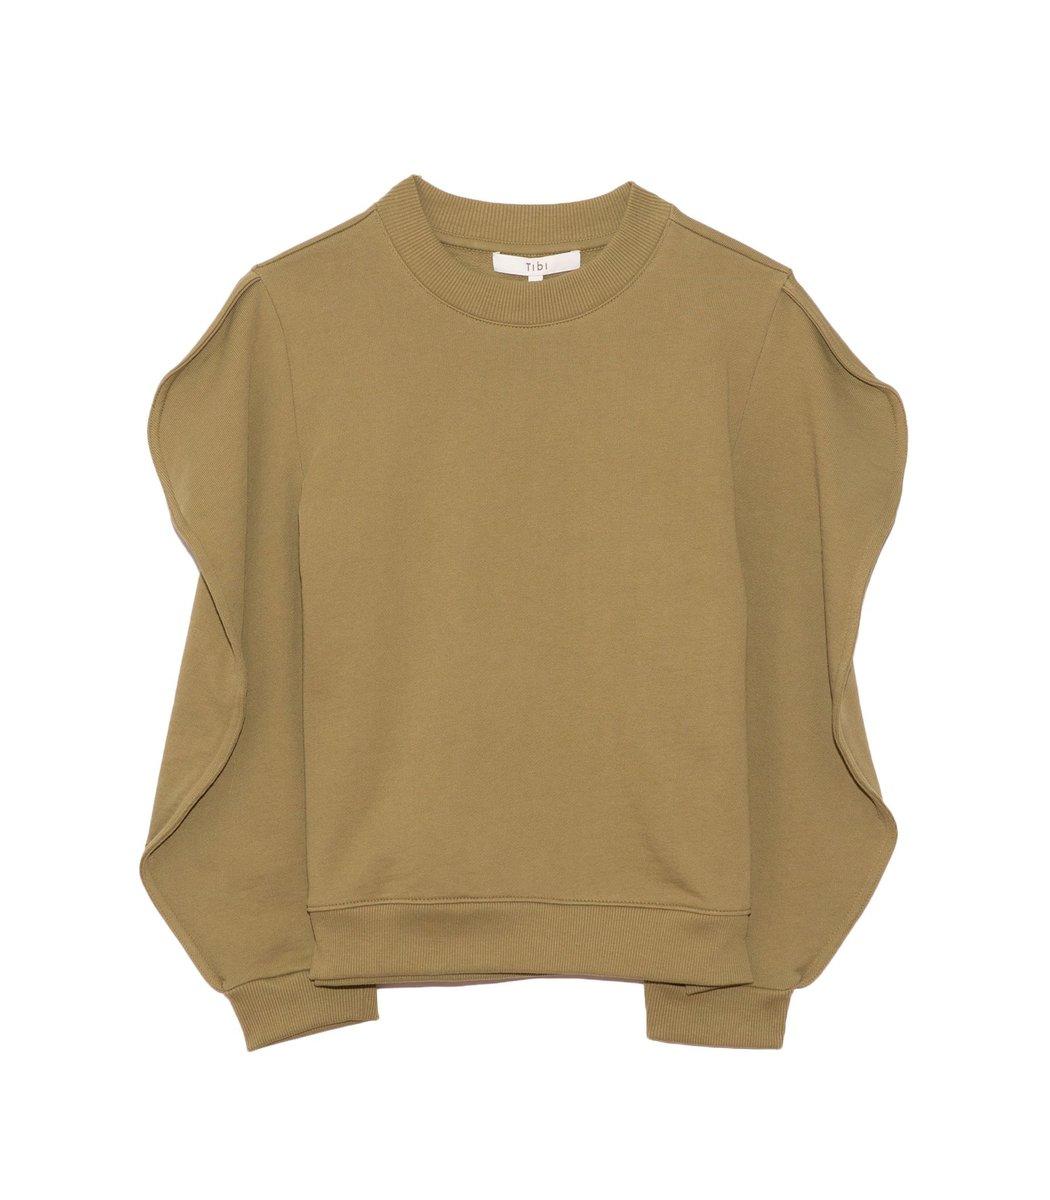 Tibi Cottons Scallop Sweatshirt in Moss